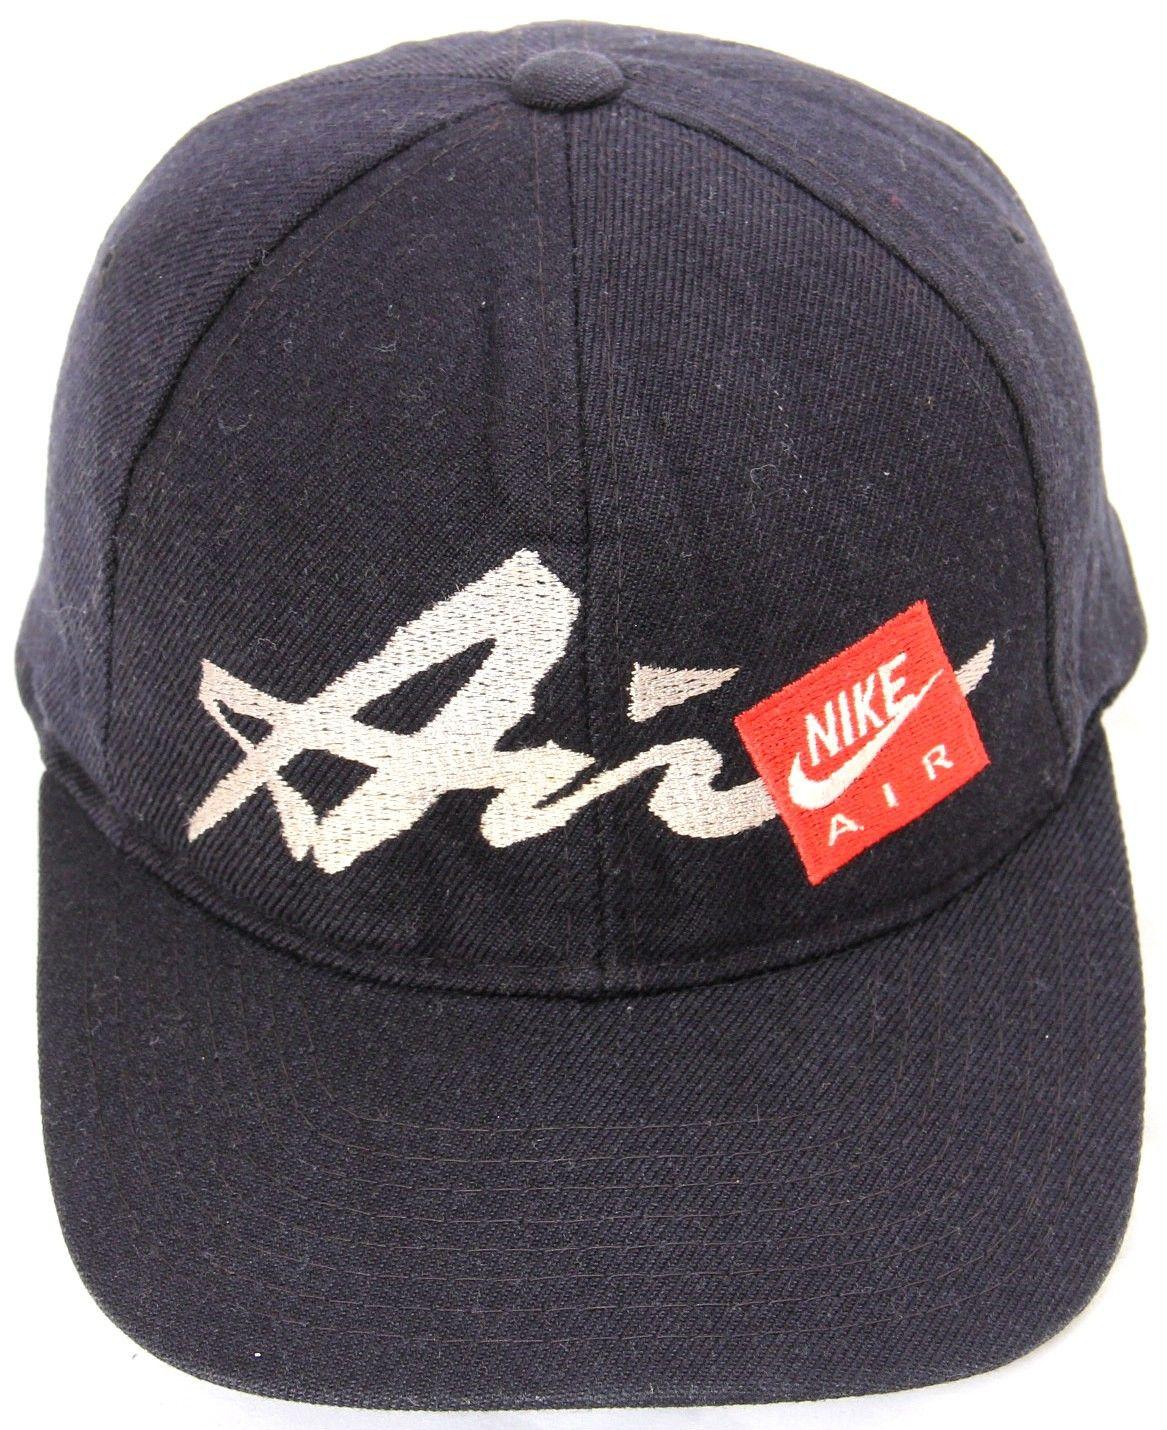 f1eee2e7 Vintage NIKE AIR Snapback Cap | snapback | Vintage nike, Snapback ...